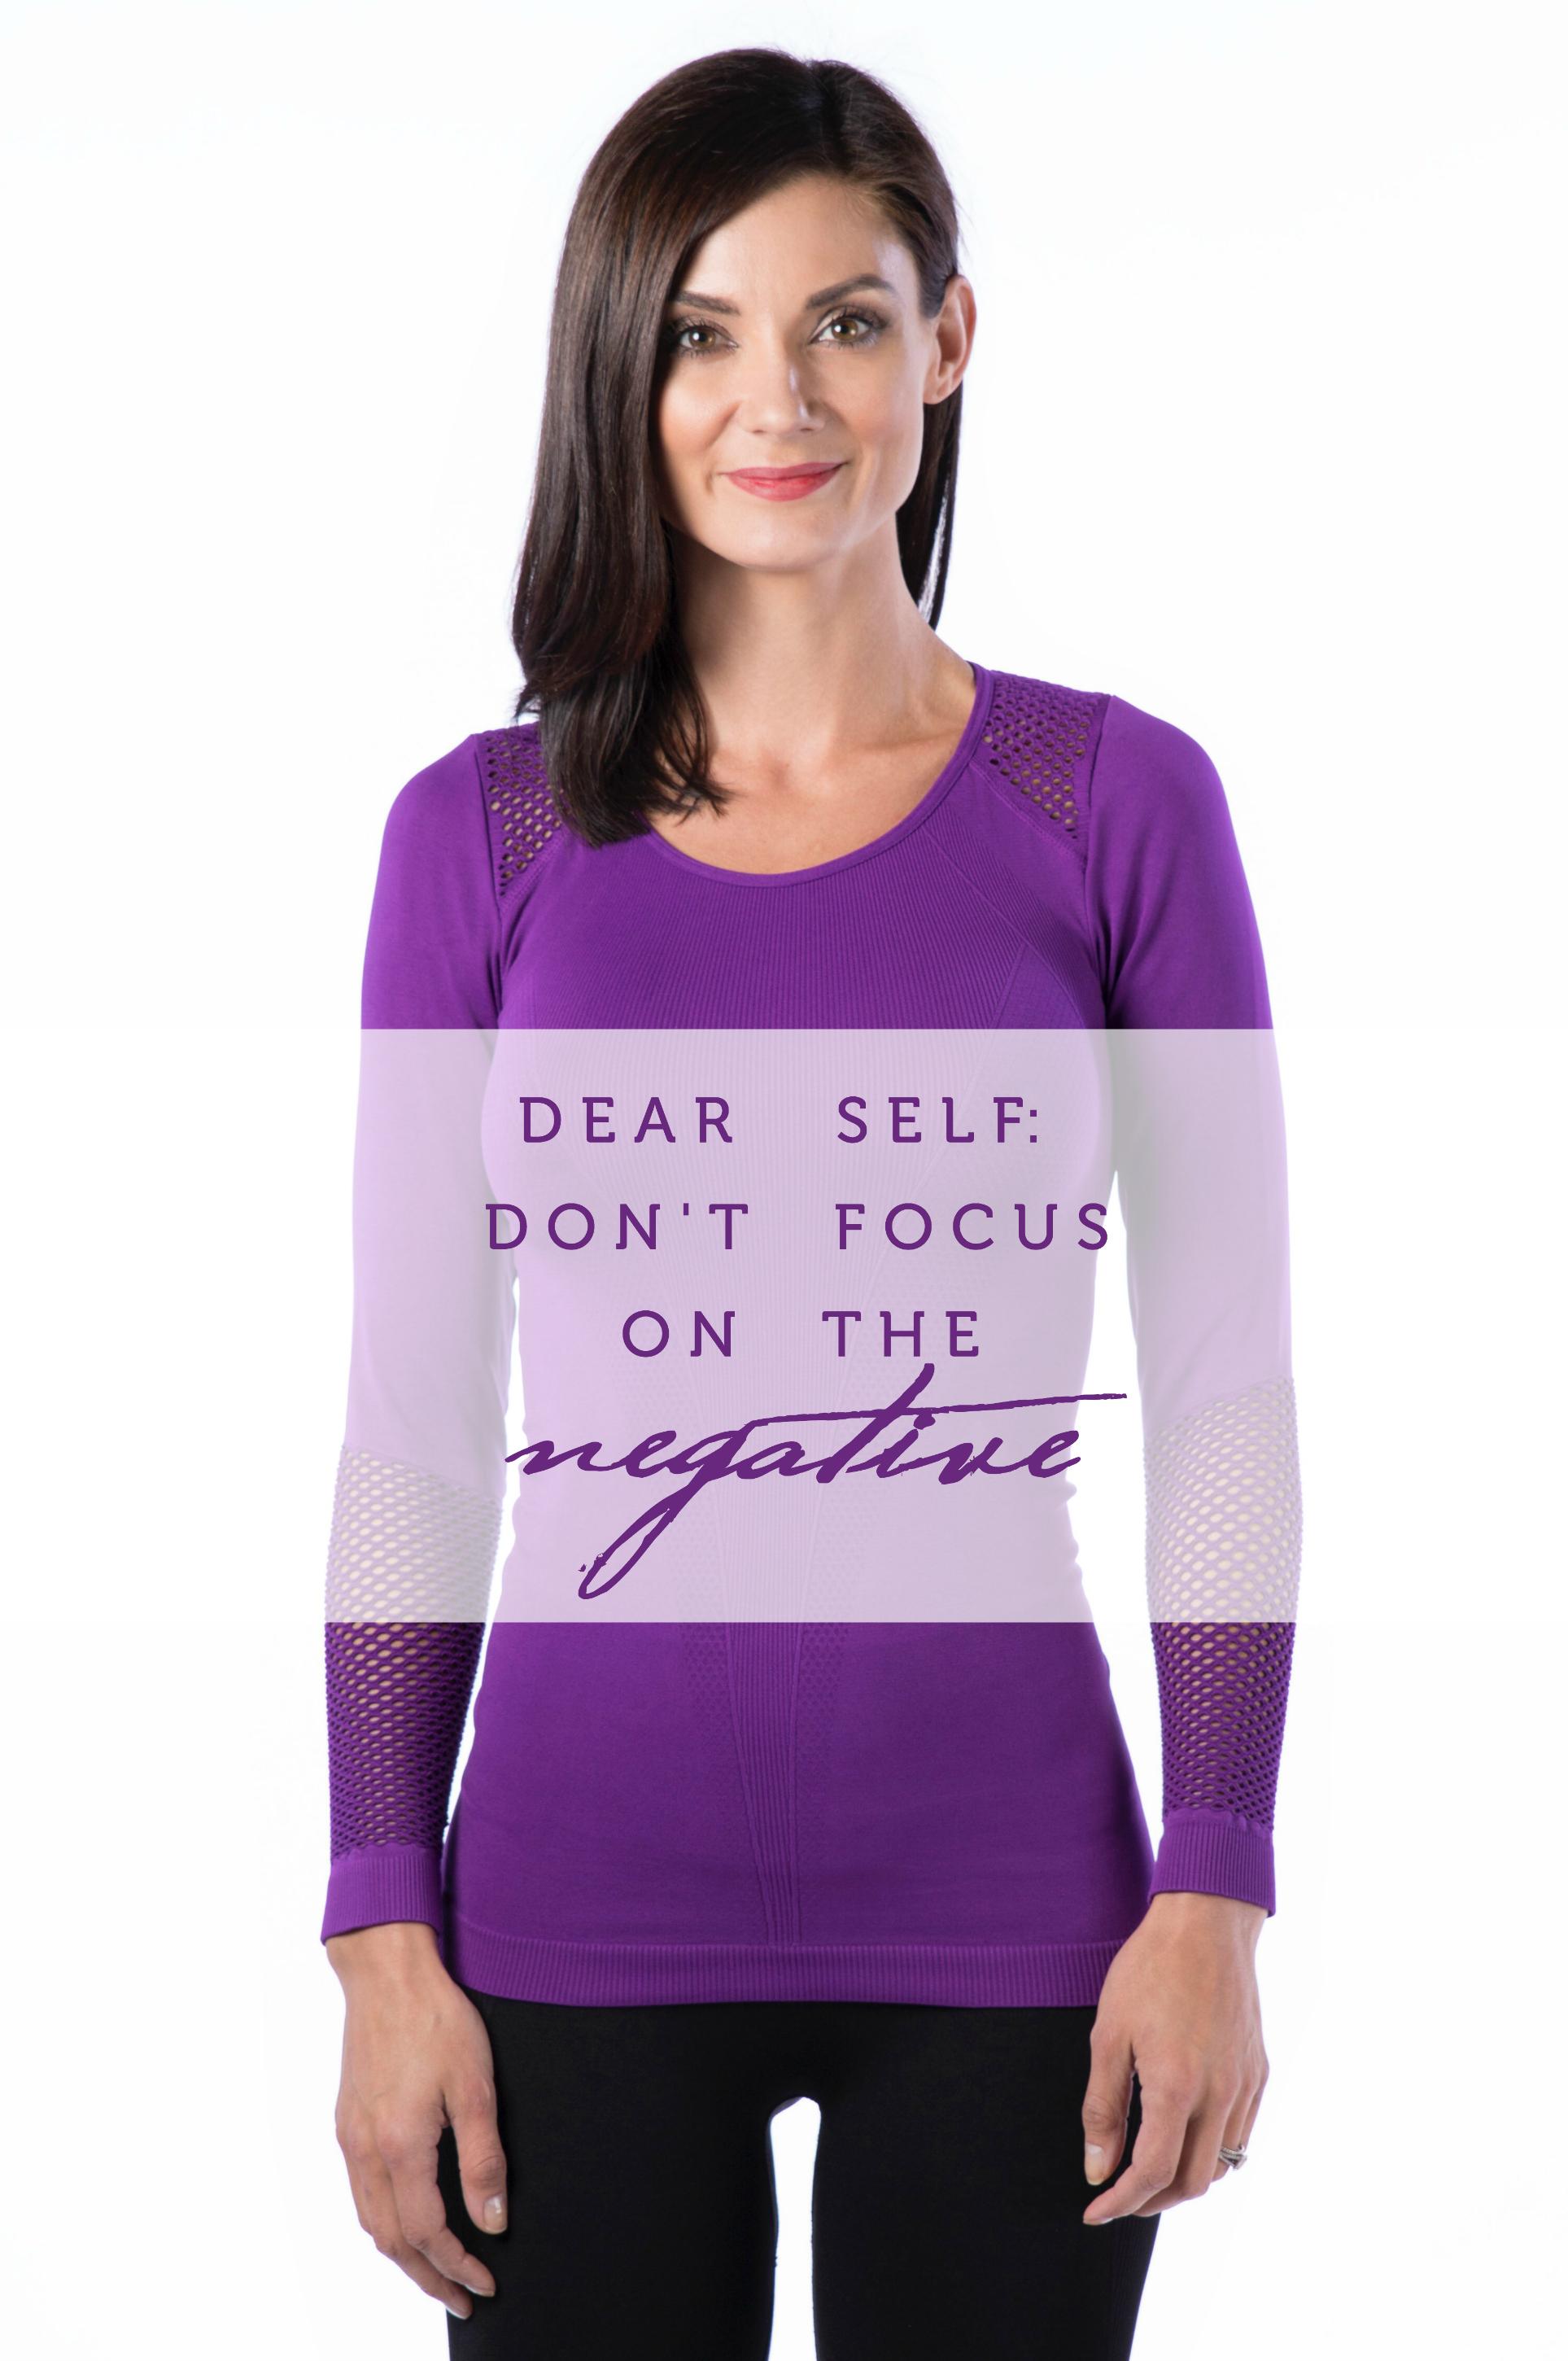 Alala Seamless Long Sleeve Tee in Electric Purple and Seamless Tight in Black